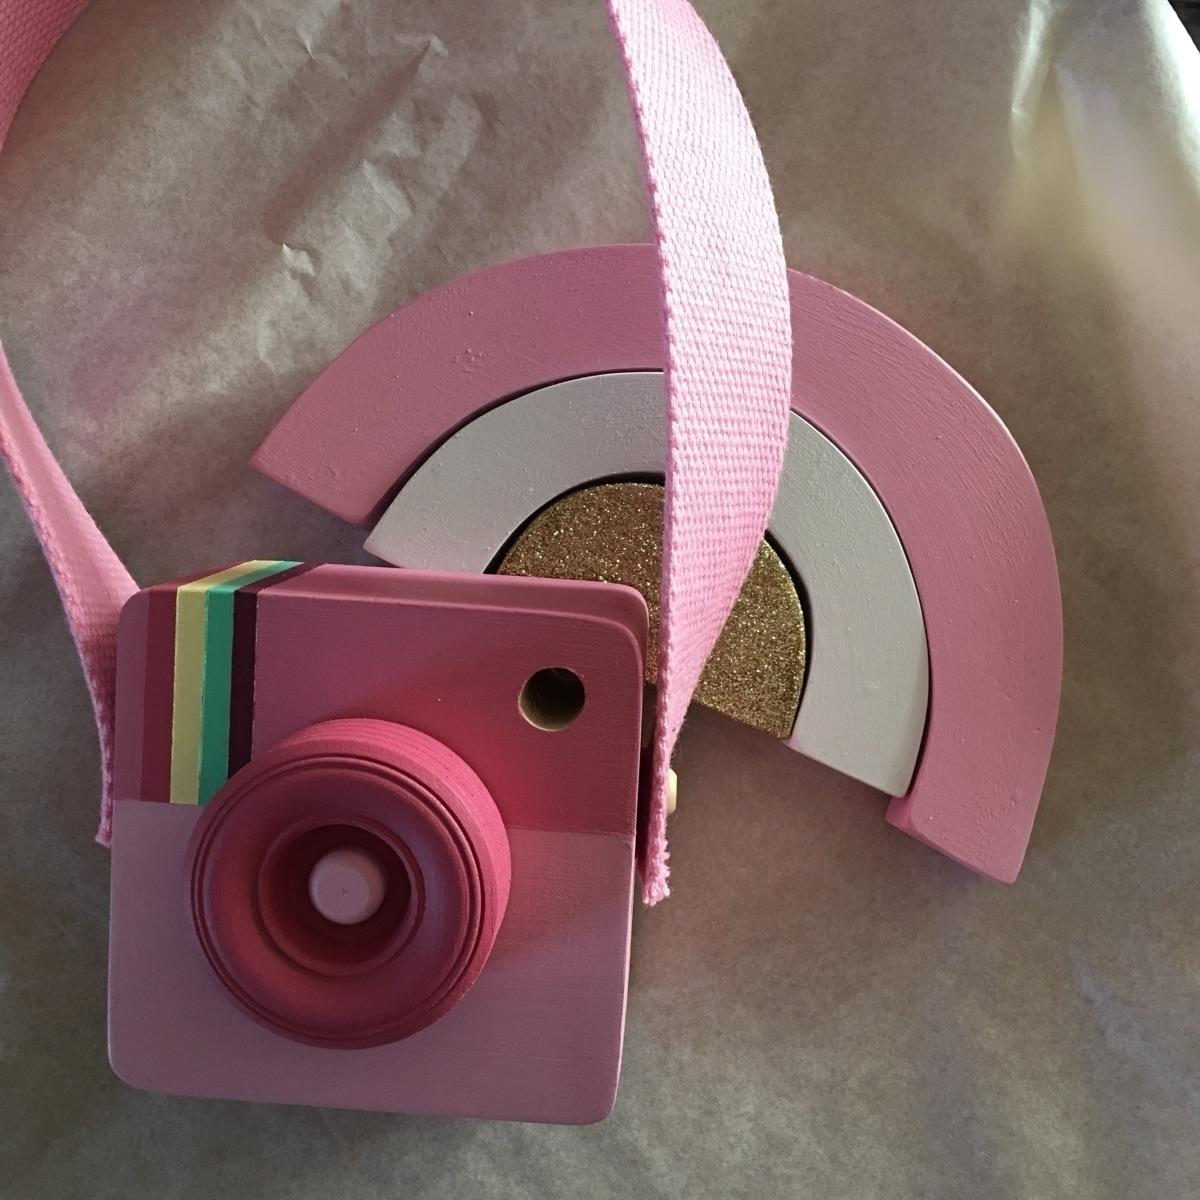 Loving bit pink sparkle afterno - popnjay | ello